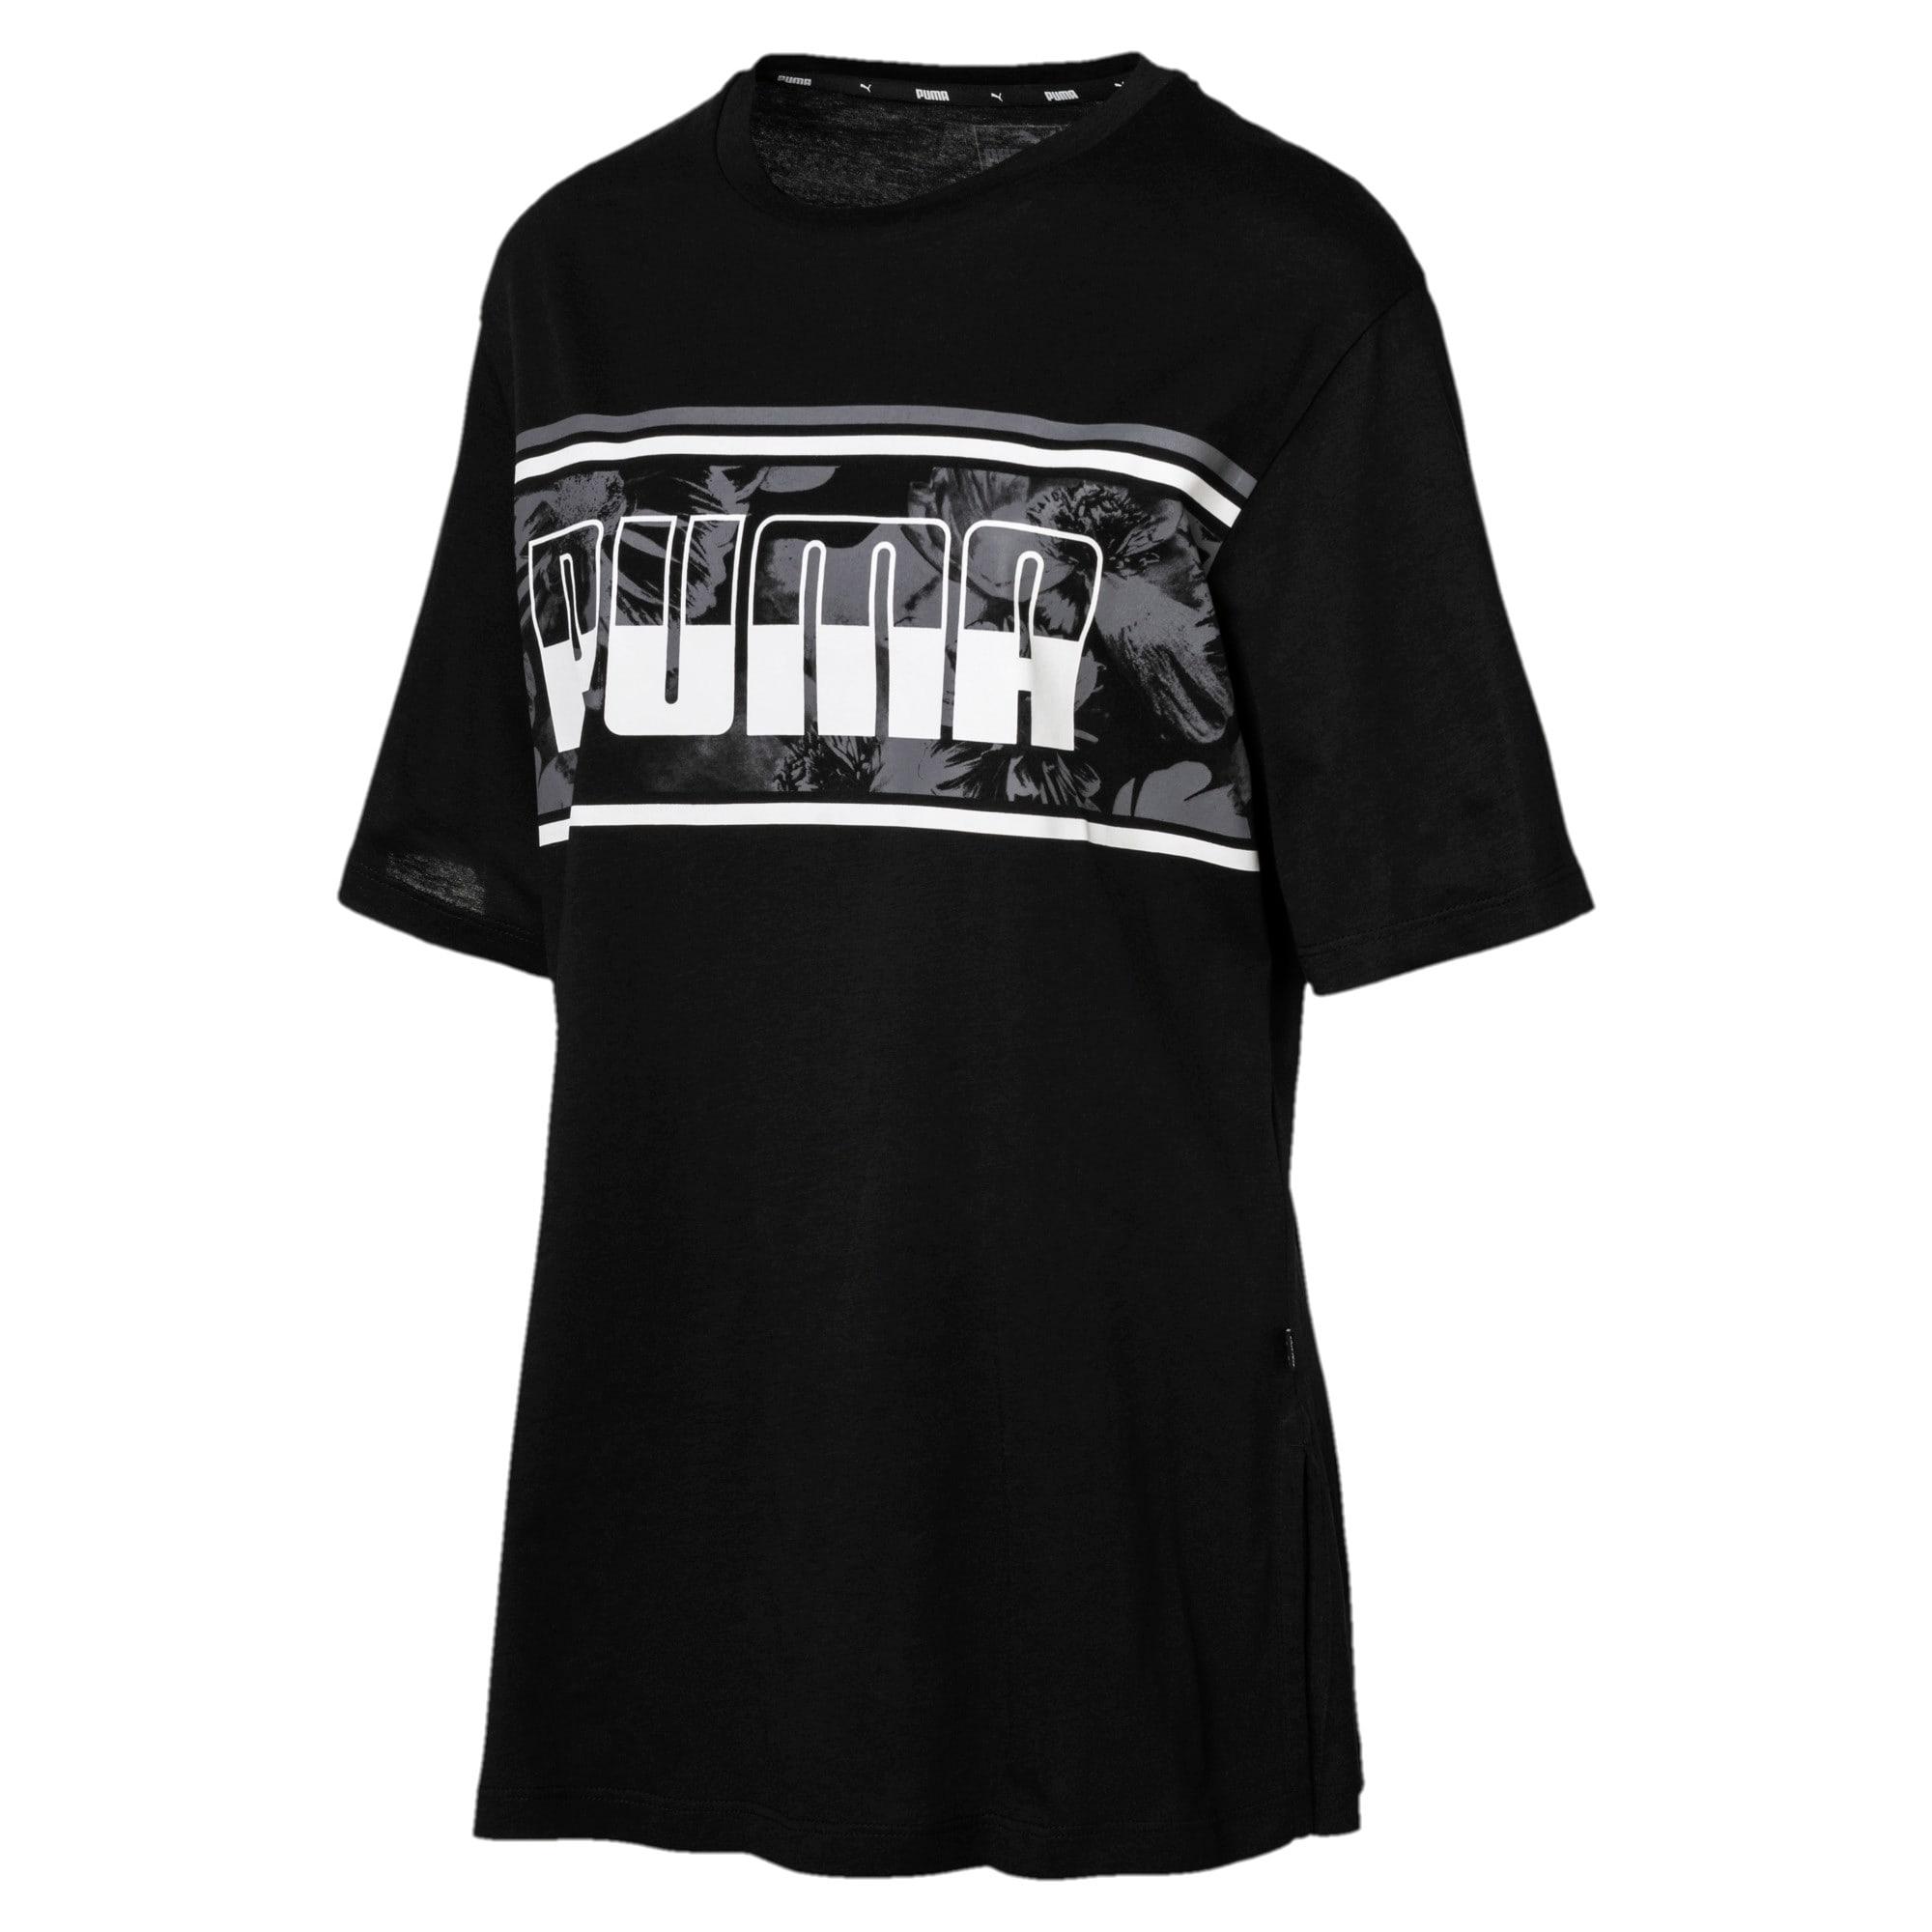 Thumbnail 1 of REBEL Boyfriend Logo T-Shirt, Cotton Black, medium